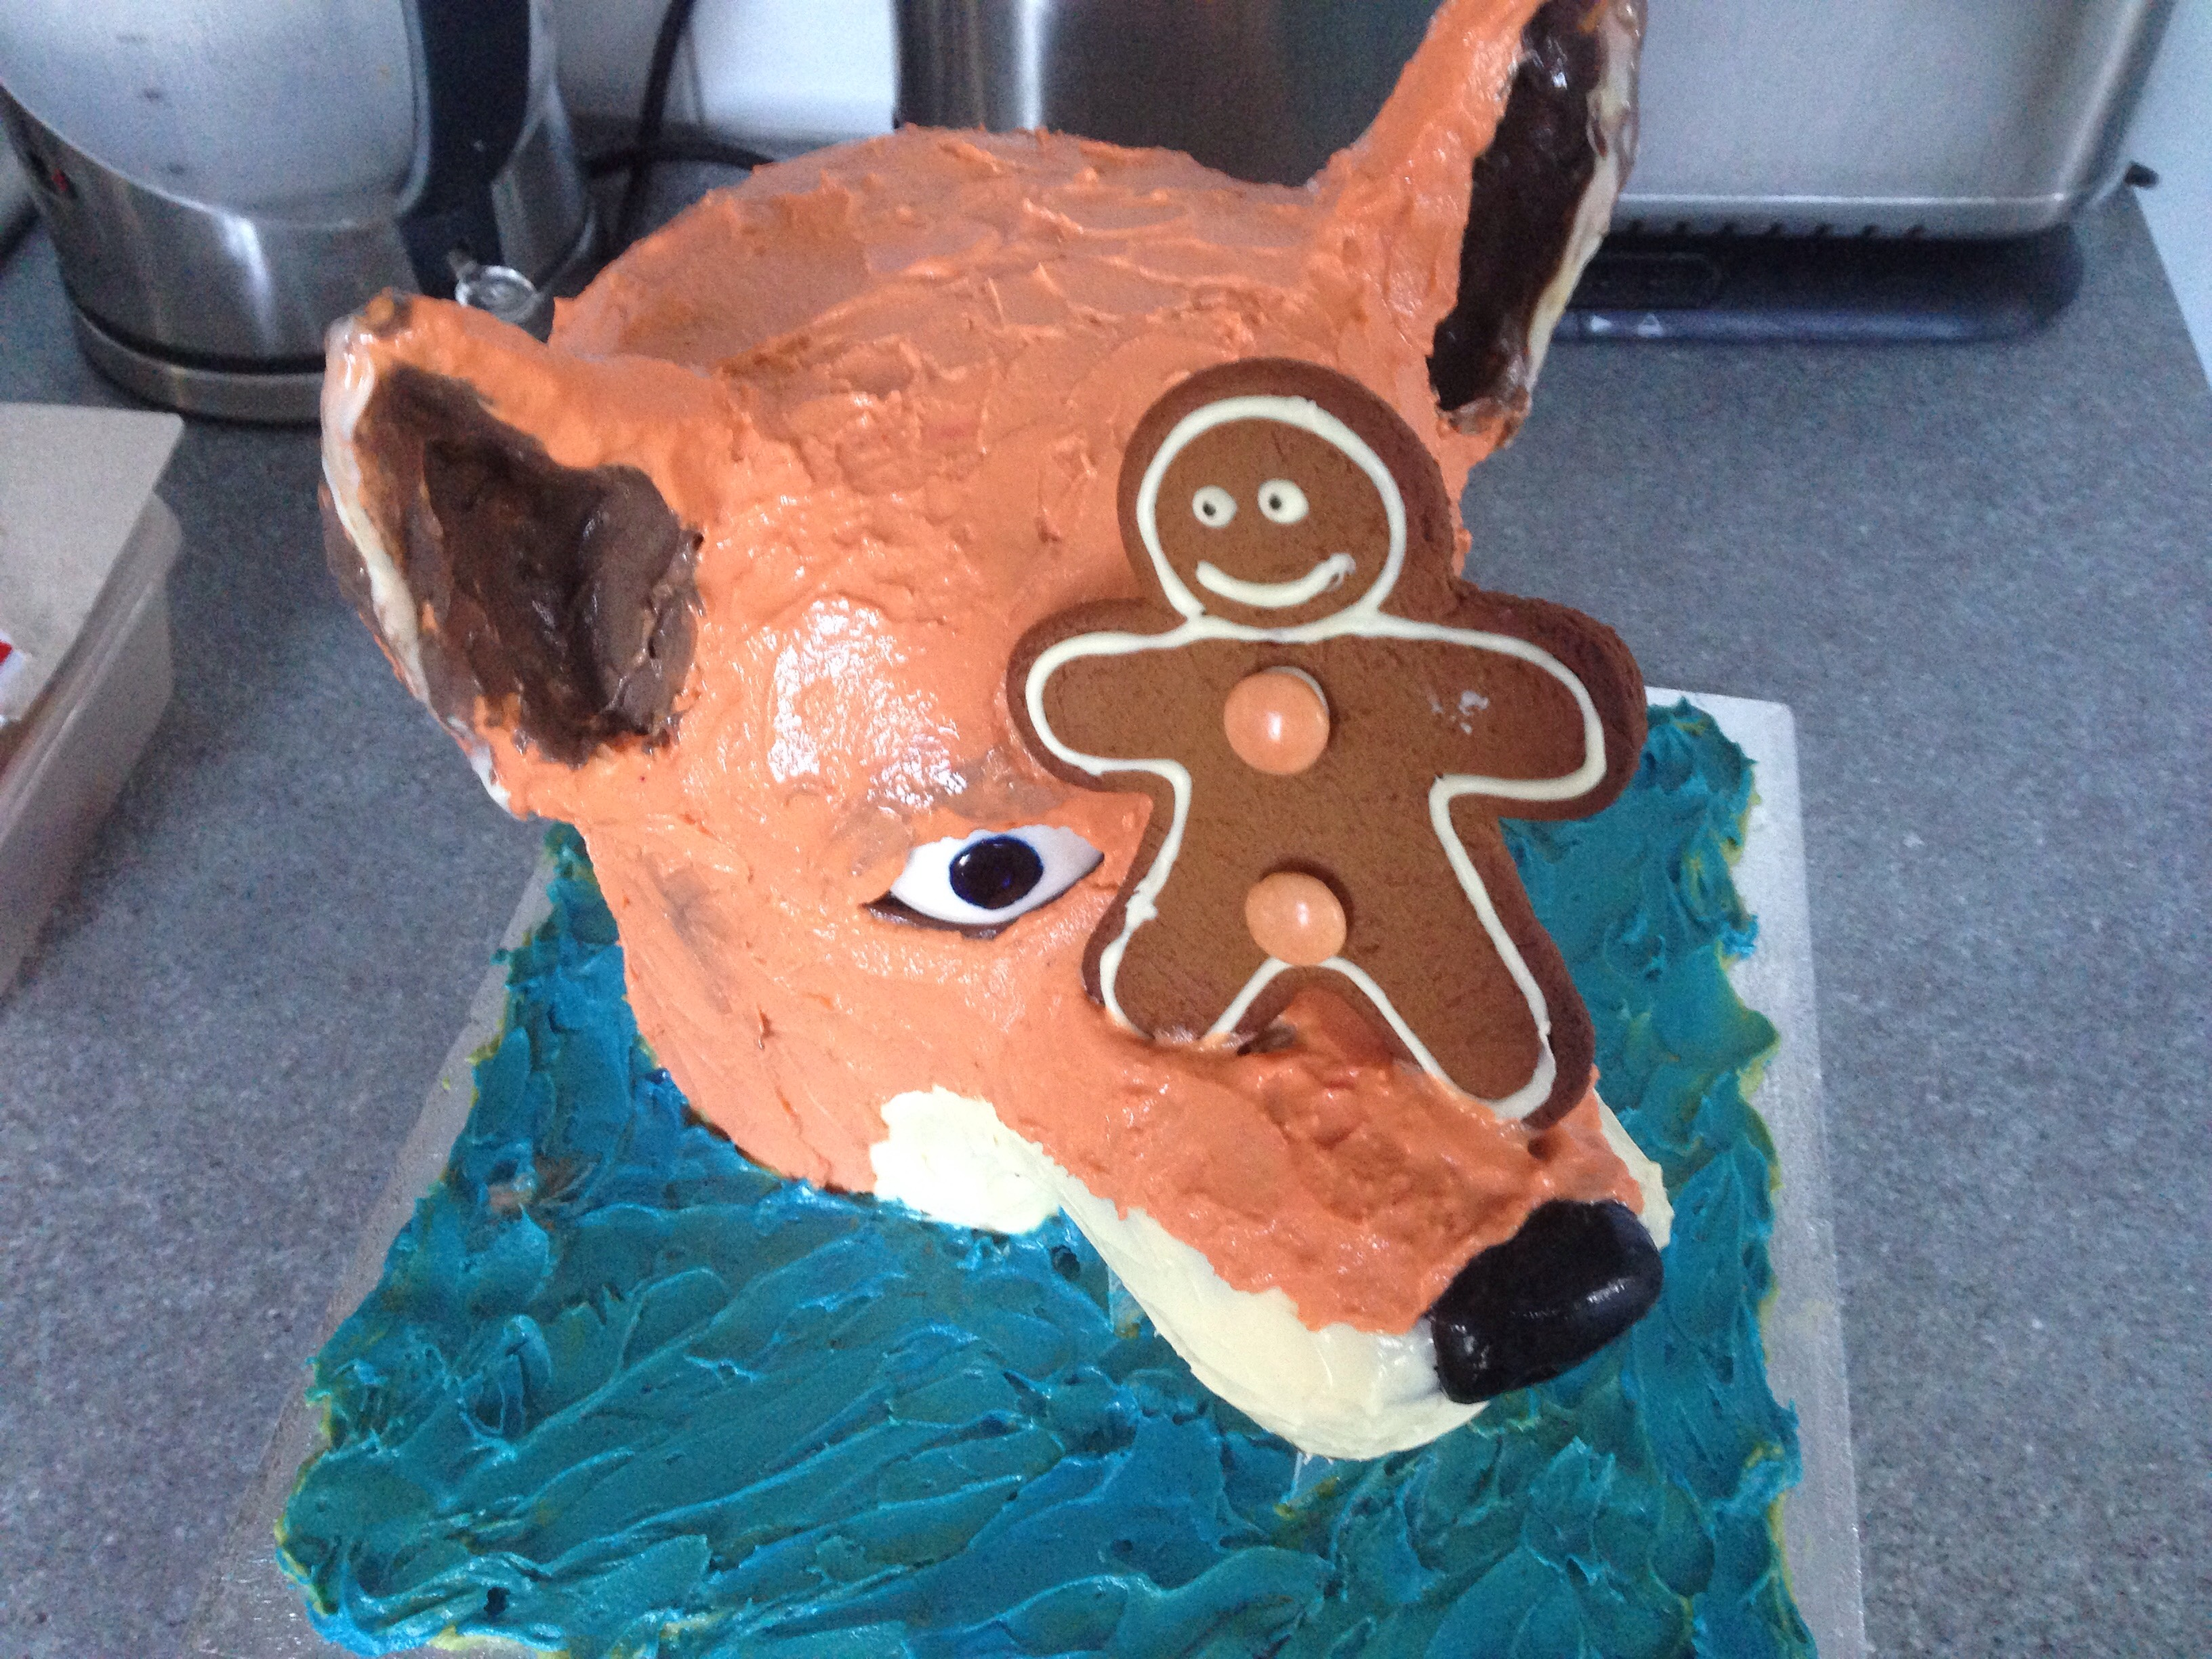 'The Gingerbread Man' Cake